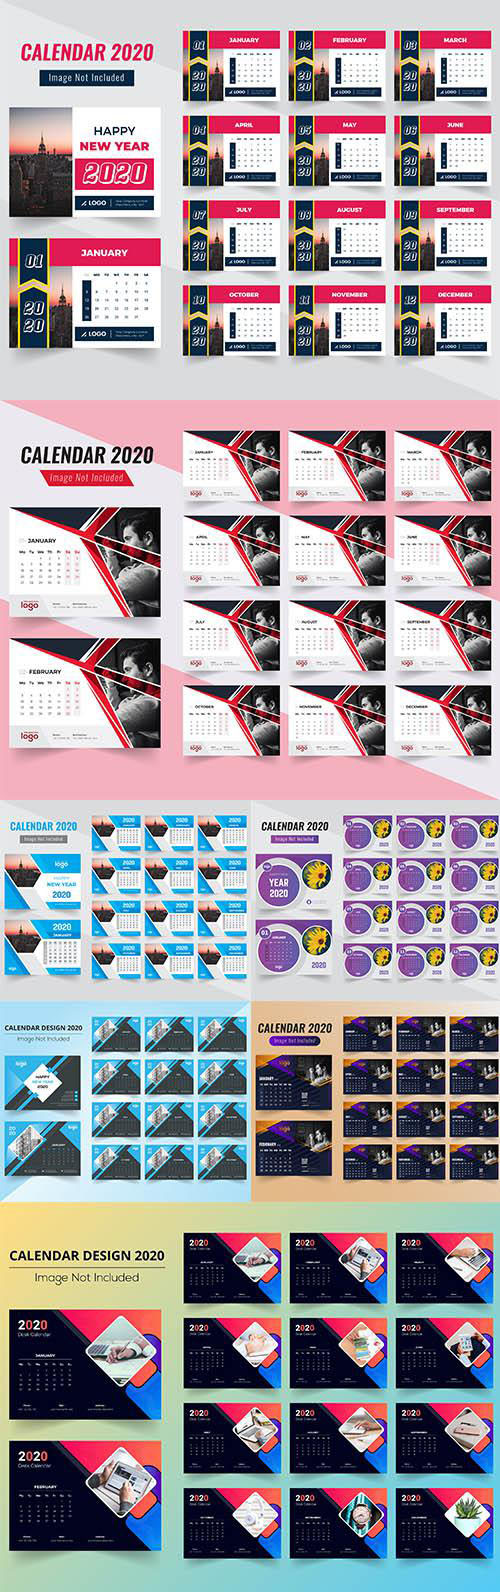 Desk Calendar 2020 Vector Pack vol.2